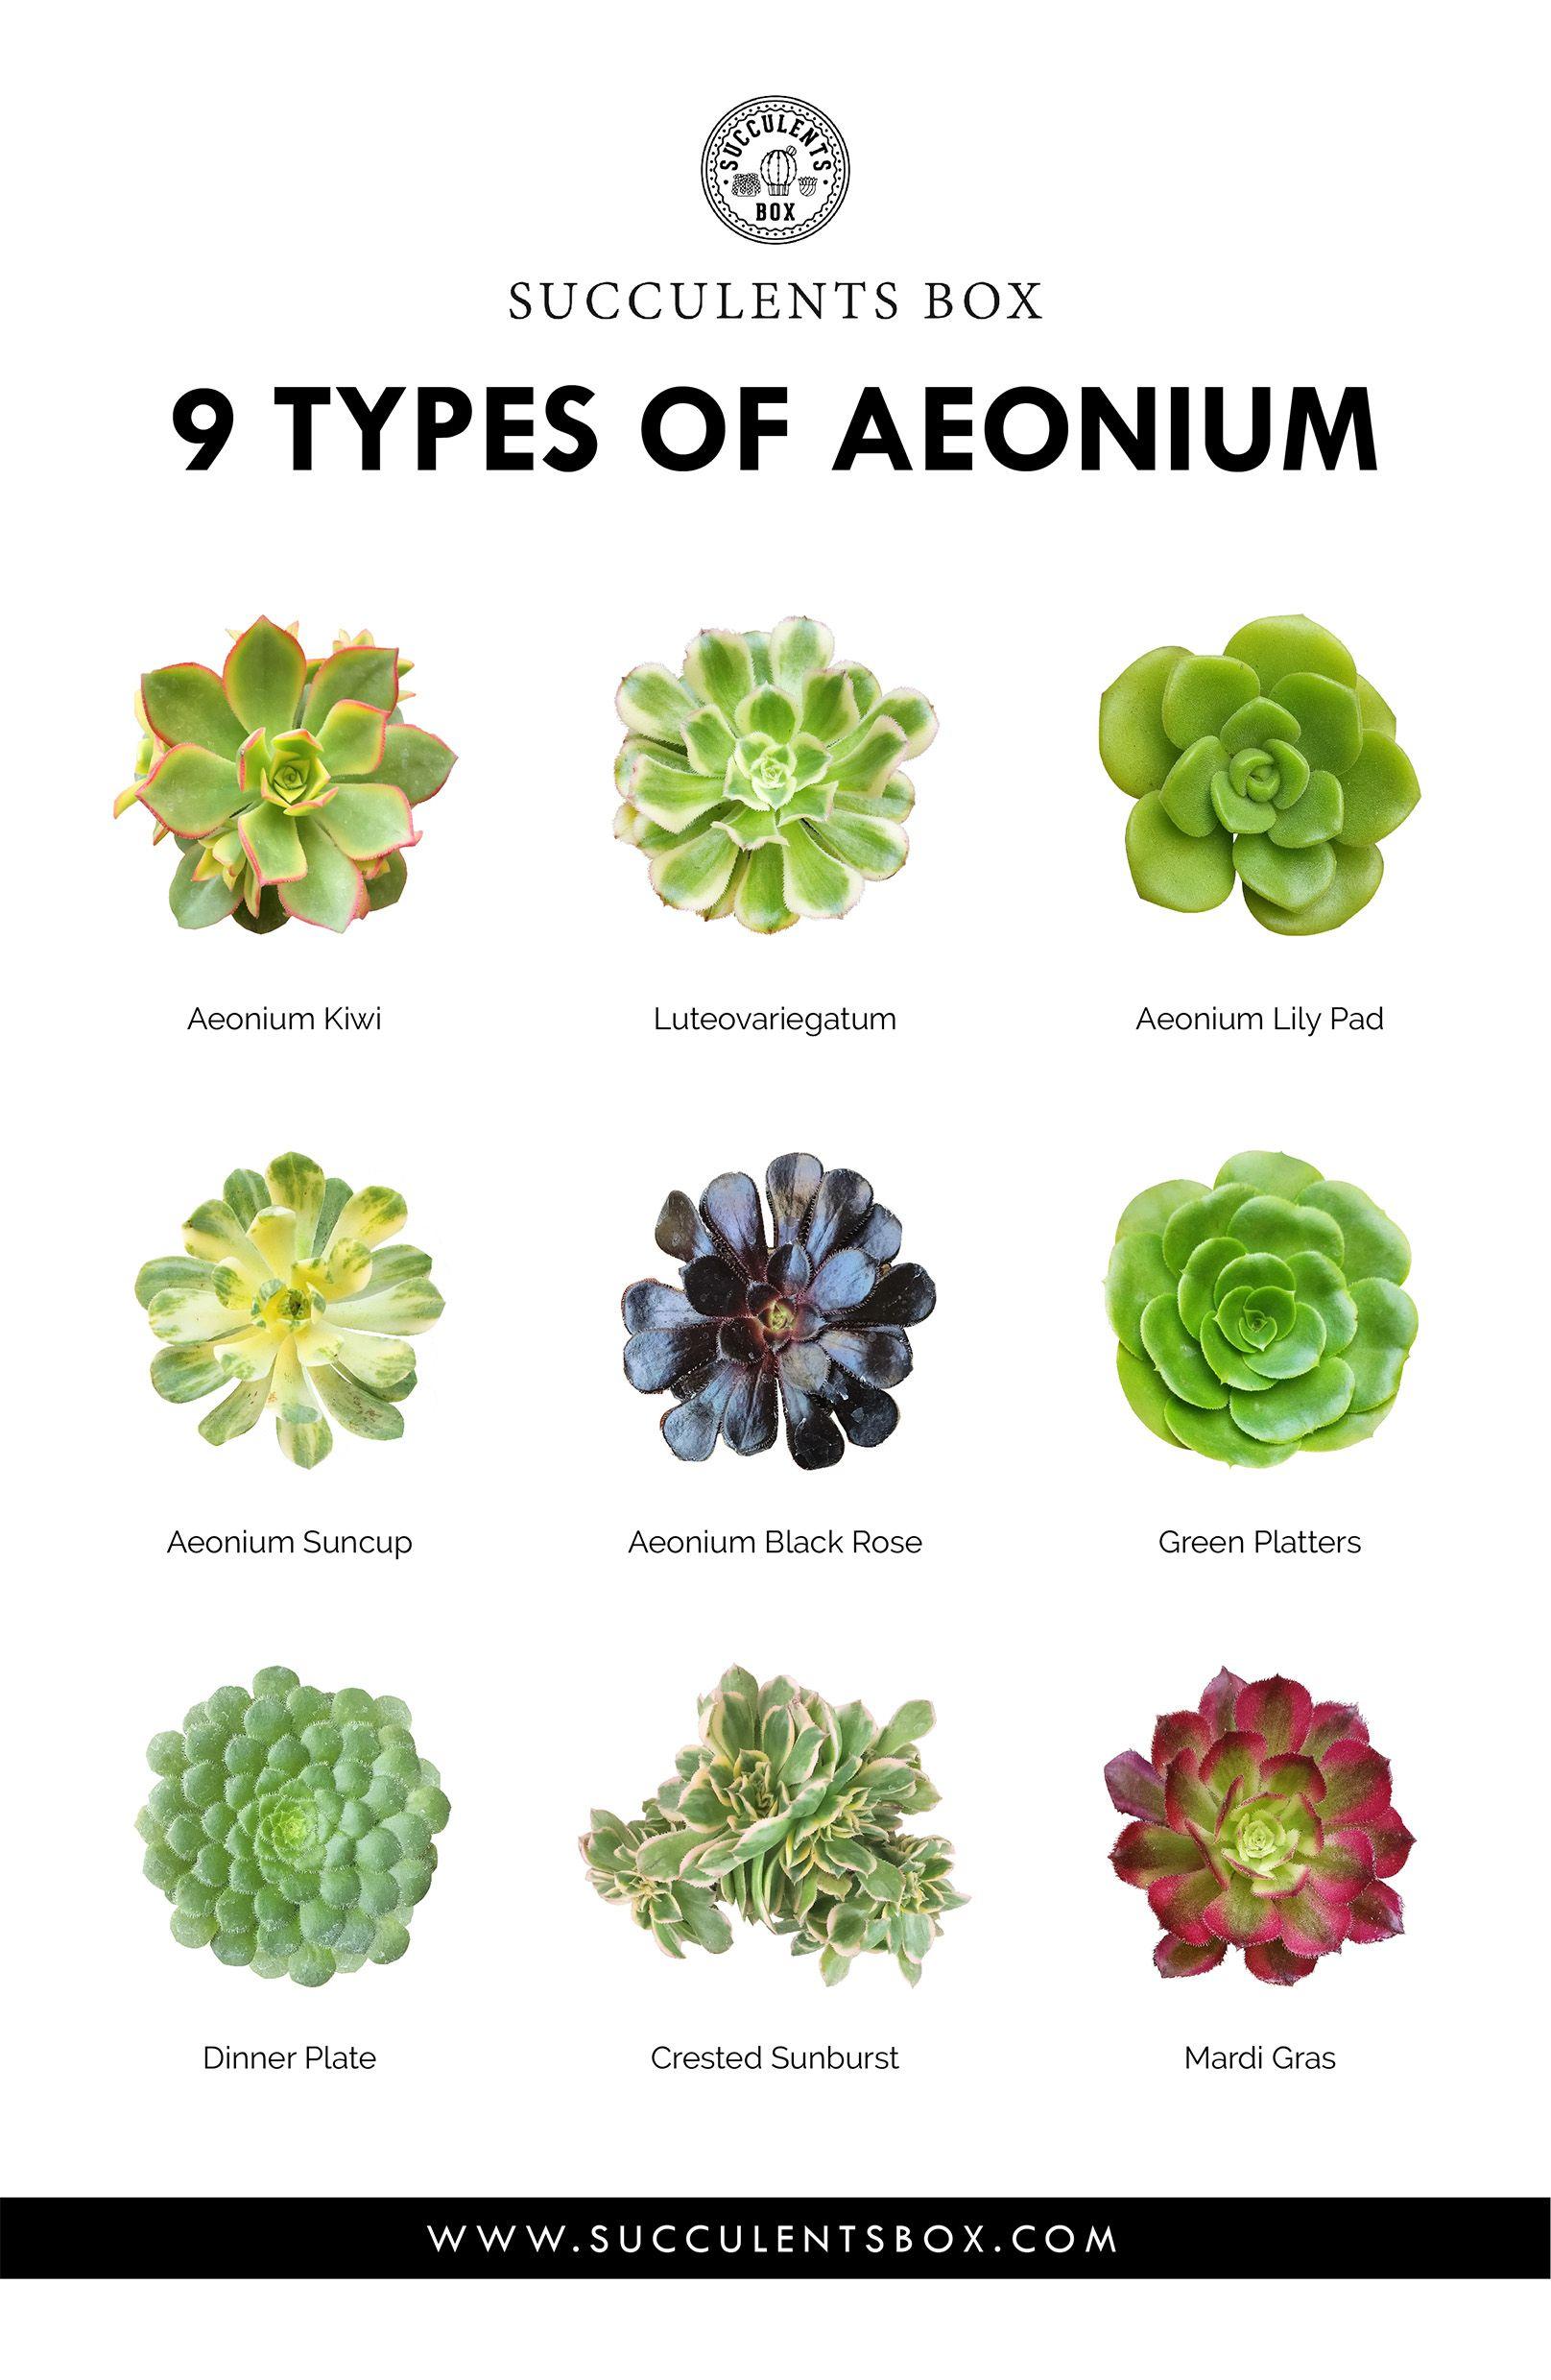 9 Types Of Aeonium With Images Plants Succulents Succulent Box